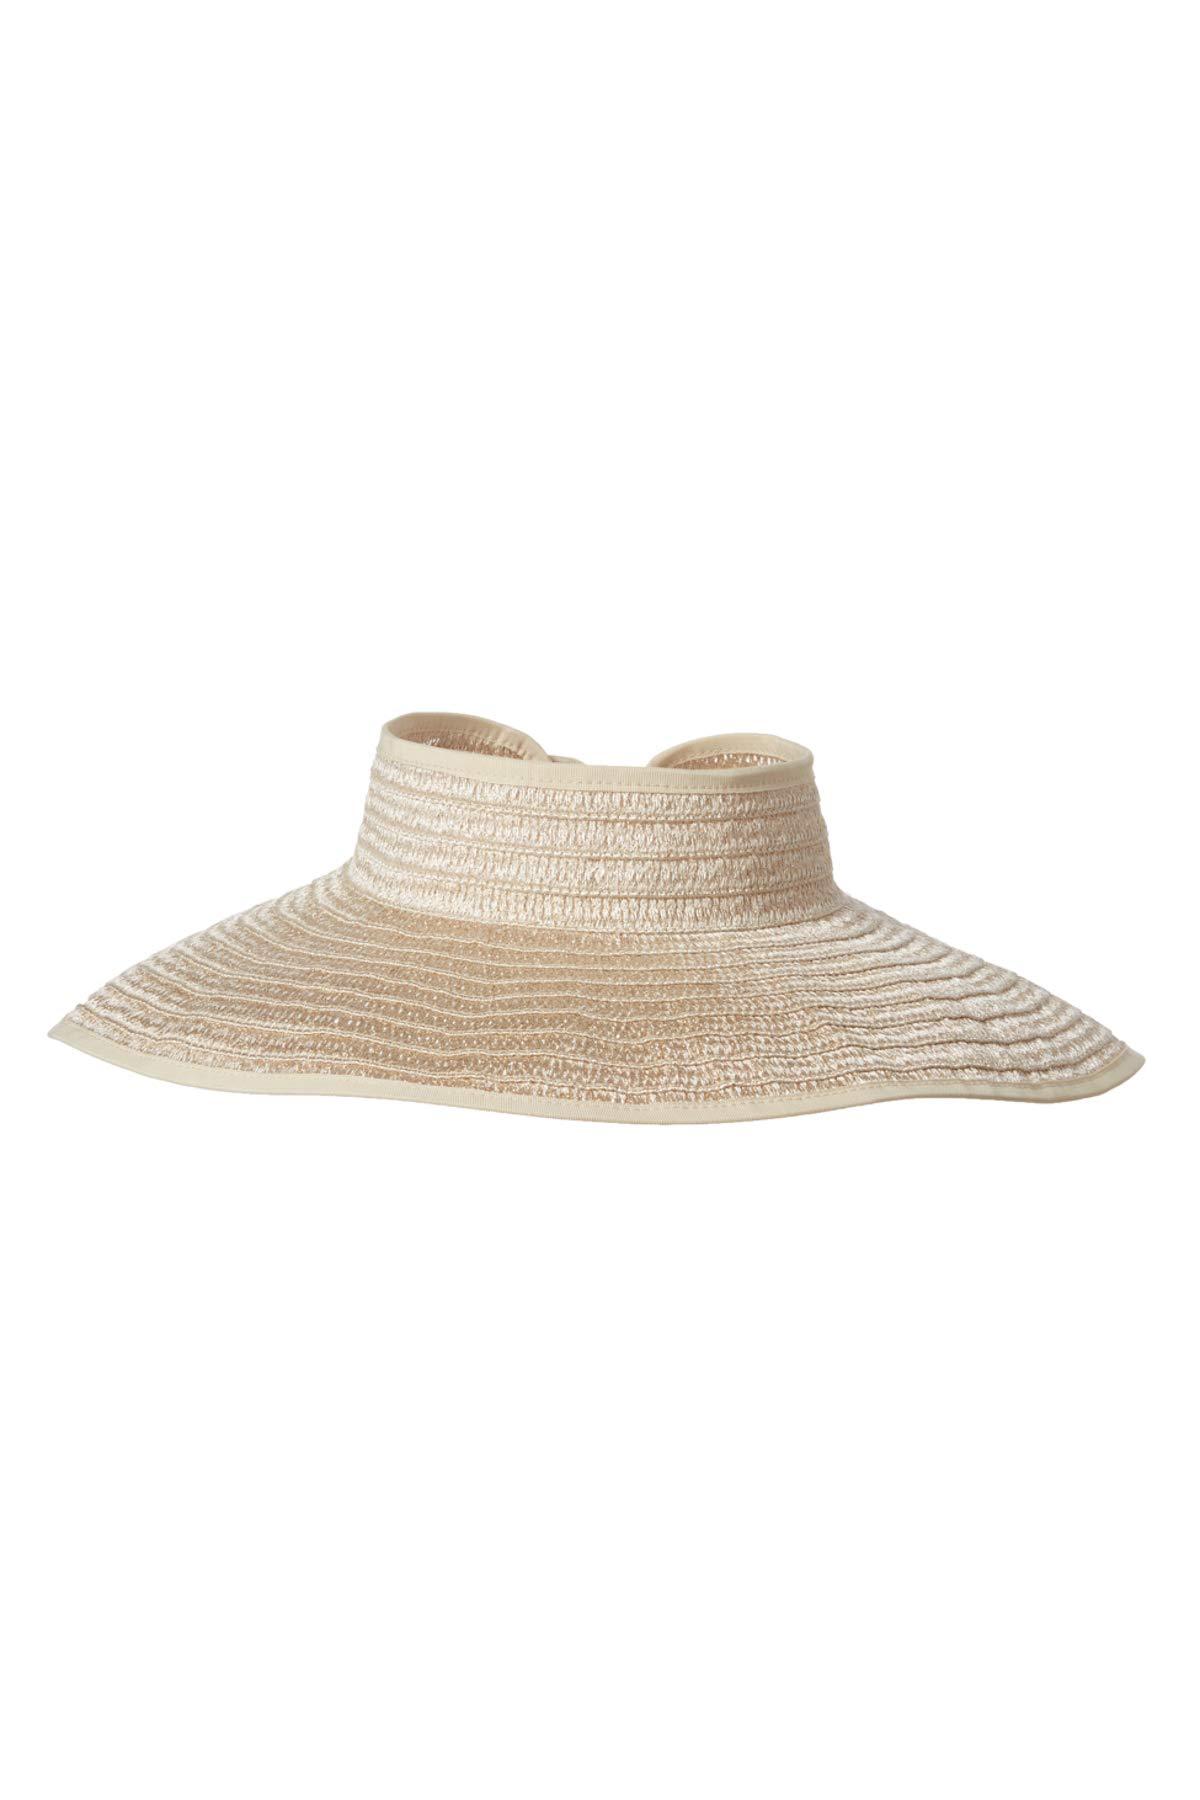 San Diego Hat Metallic Paper Straw Visor Gold One